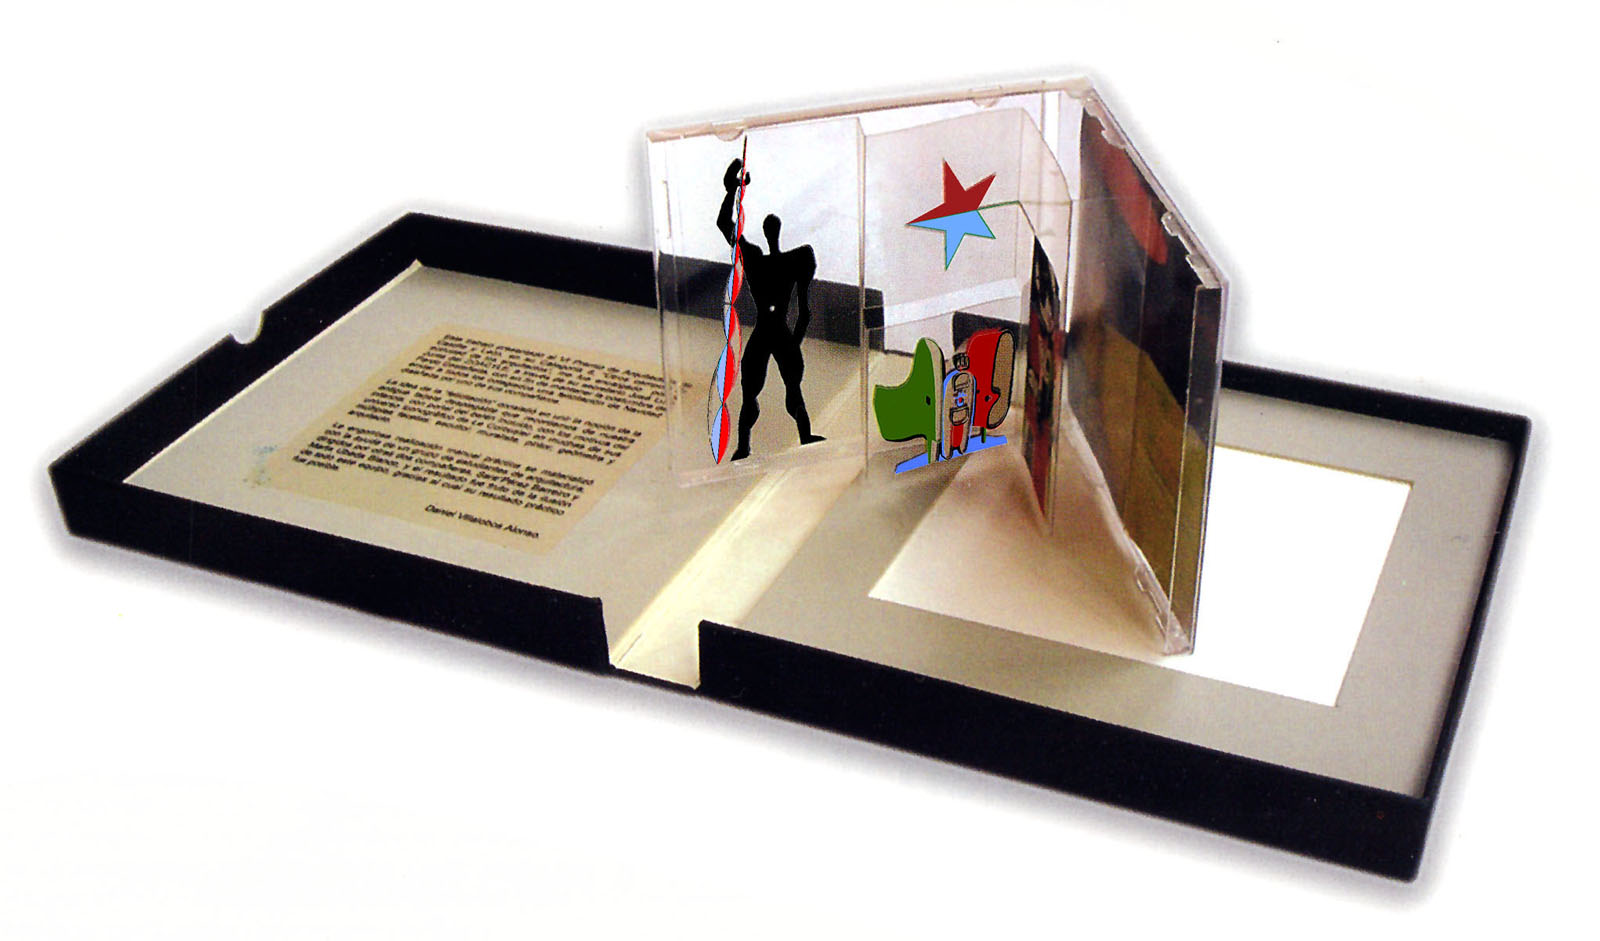 danielvillalobos-graphicdesign-lecorbusier-christmasgreetingcard-7